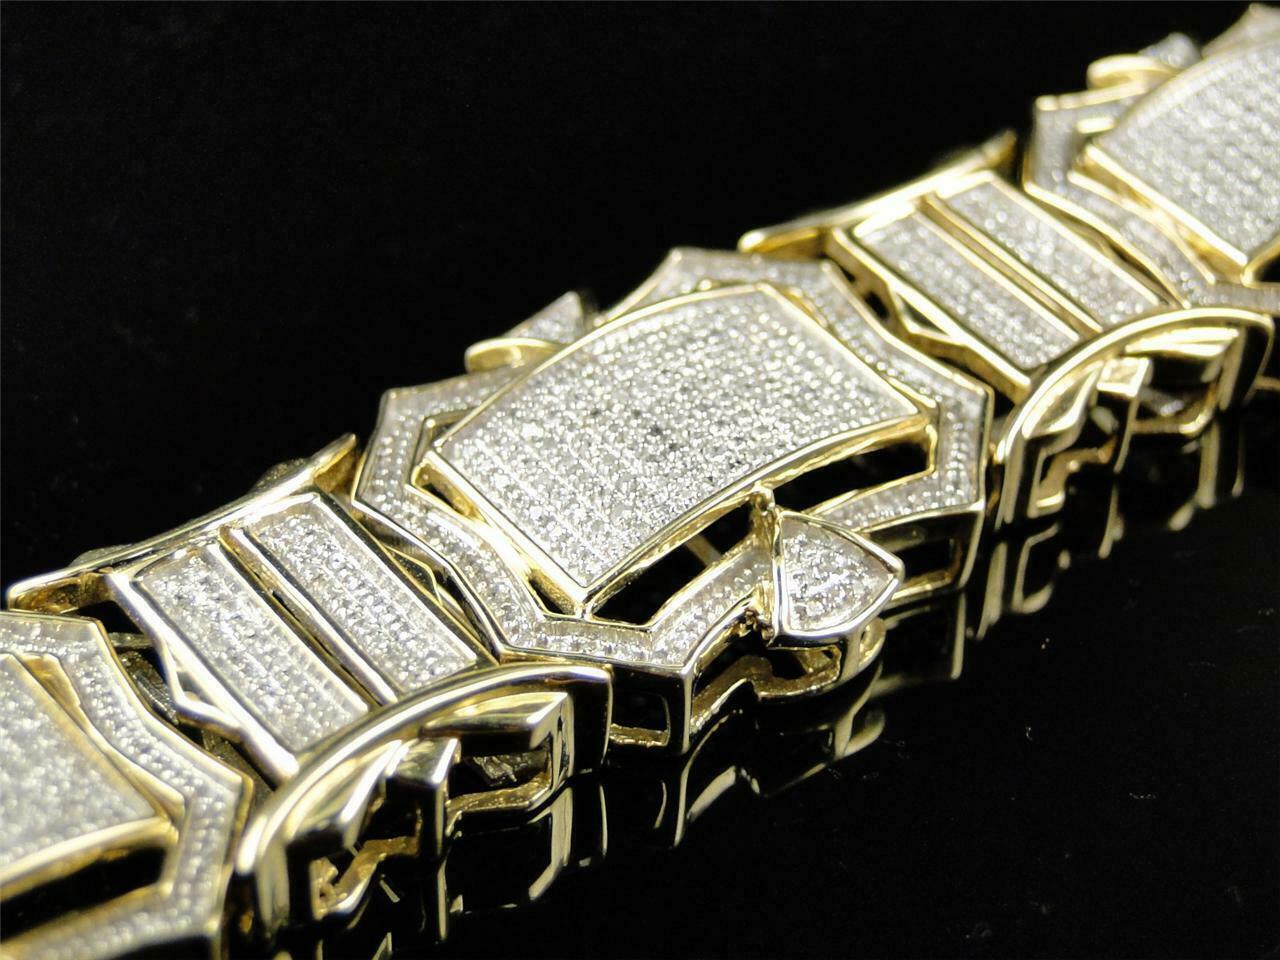 12CT Diamond 14K Men's Yellow Gold Over Engagement Exclusive Tennis Bracelet 4